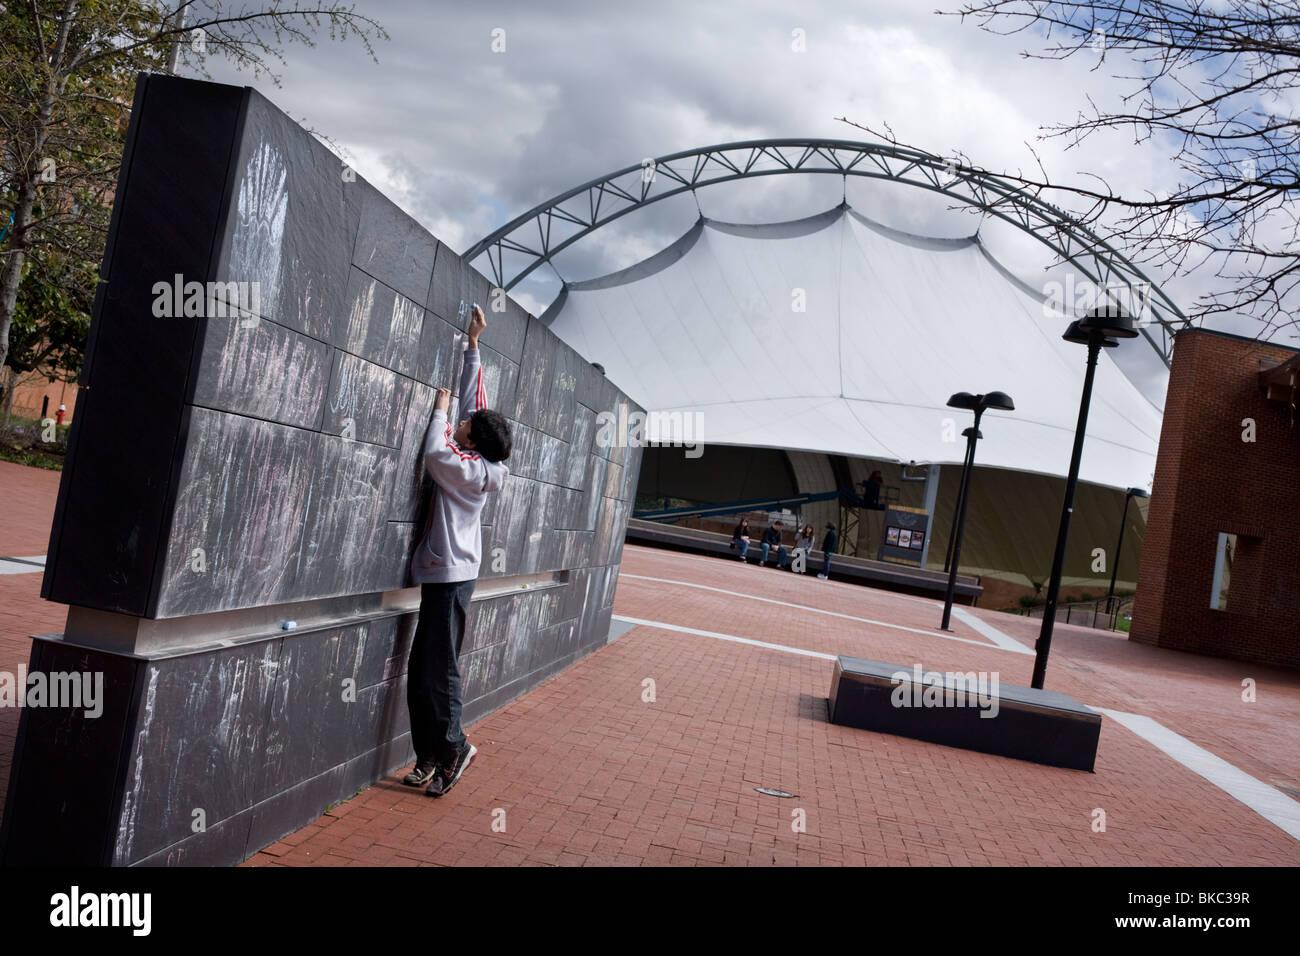 Boy draws on Community Chalkboard and Podium, Downtown Mall, Pavilion behind, Charlottesville, Virginia - Stock Image